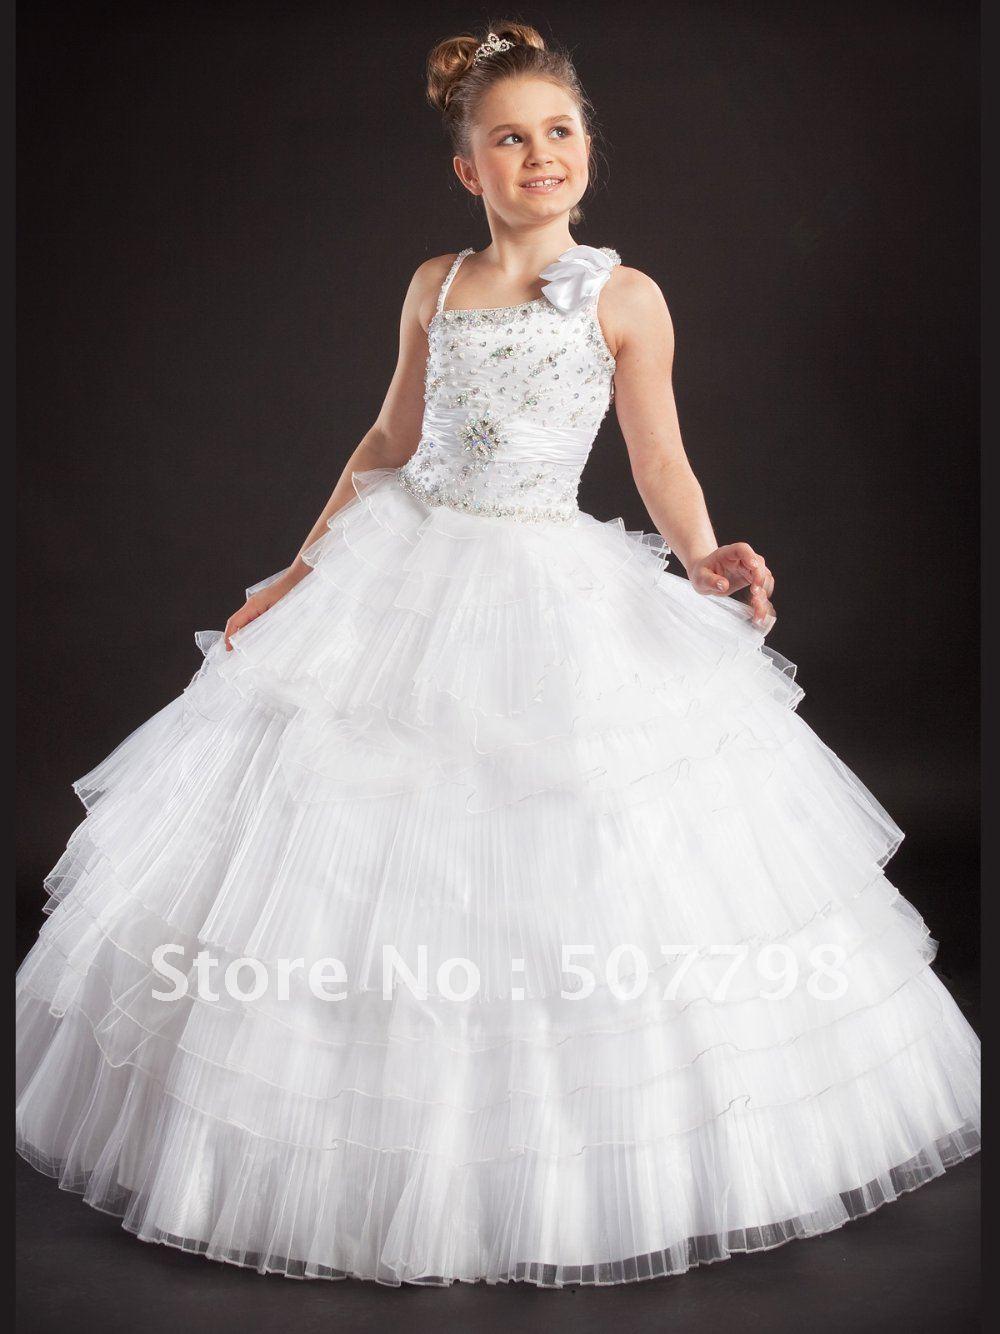 Layered tulles wedding flower girl pageant dress 2 14 for Kids dresses for wedding